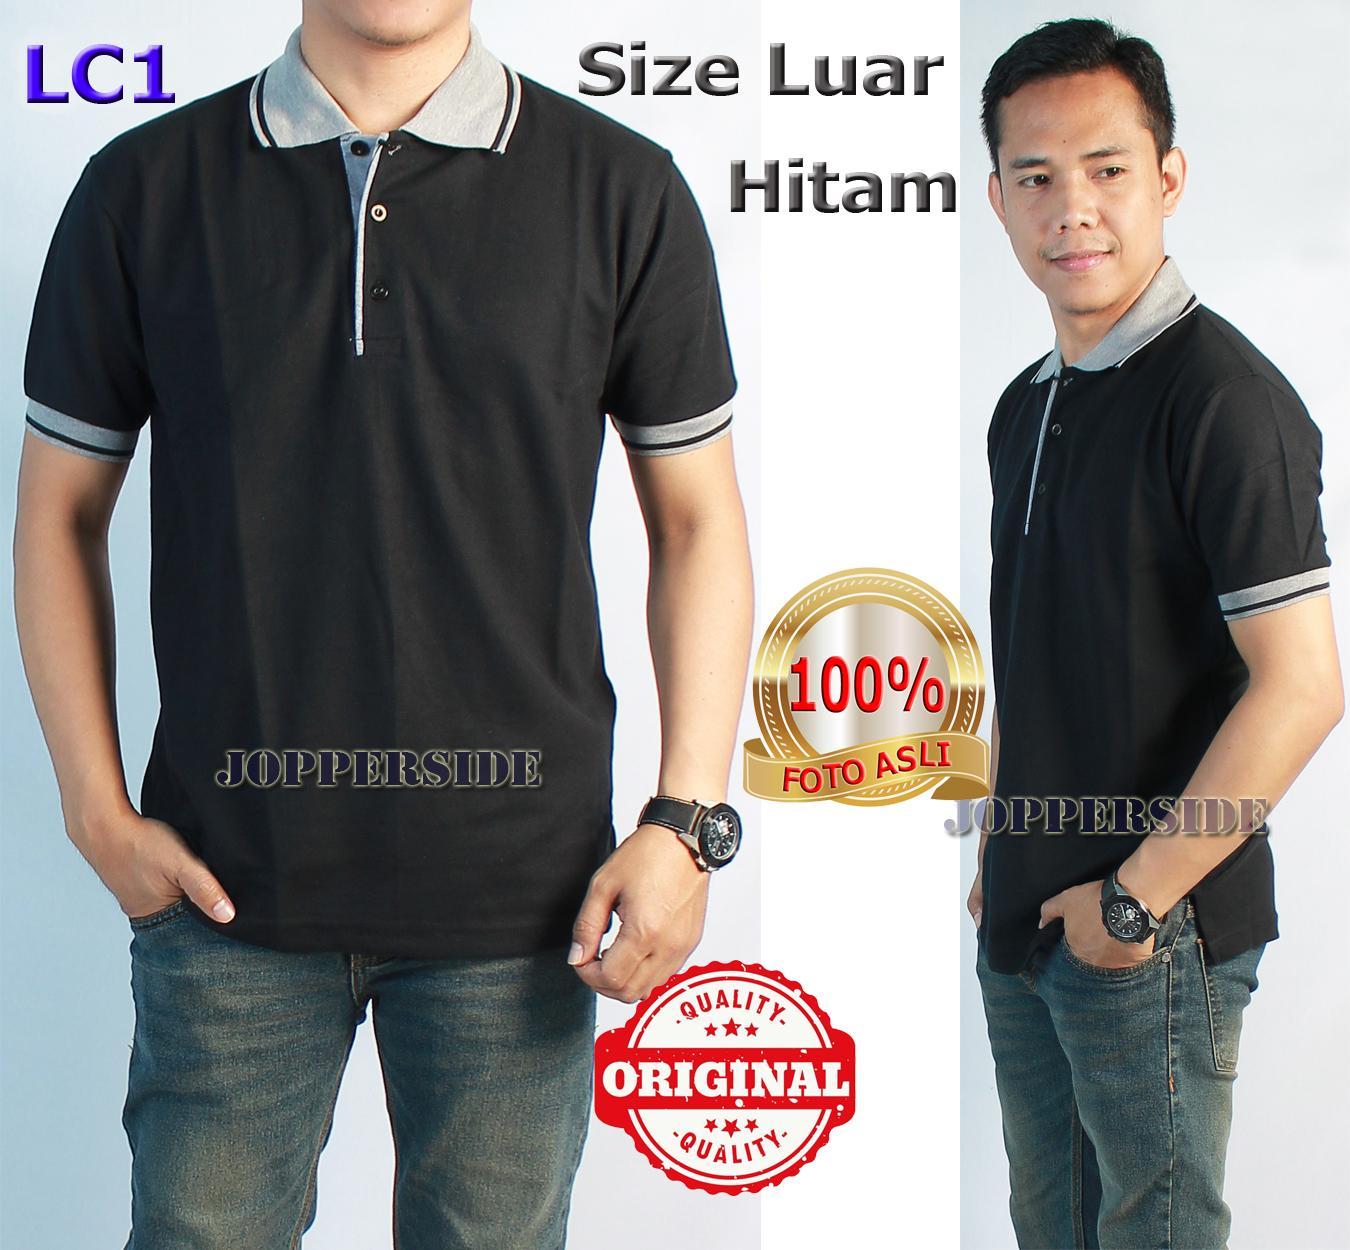 Kelebihan Best Seller Baju Kaos Wangki Polo Shirt Polos Cowok Kerah Kombinasi Jopperside Original Pria Hitam Black Lc1